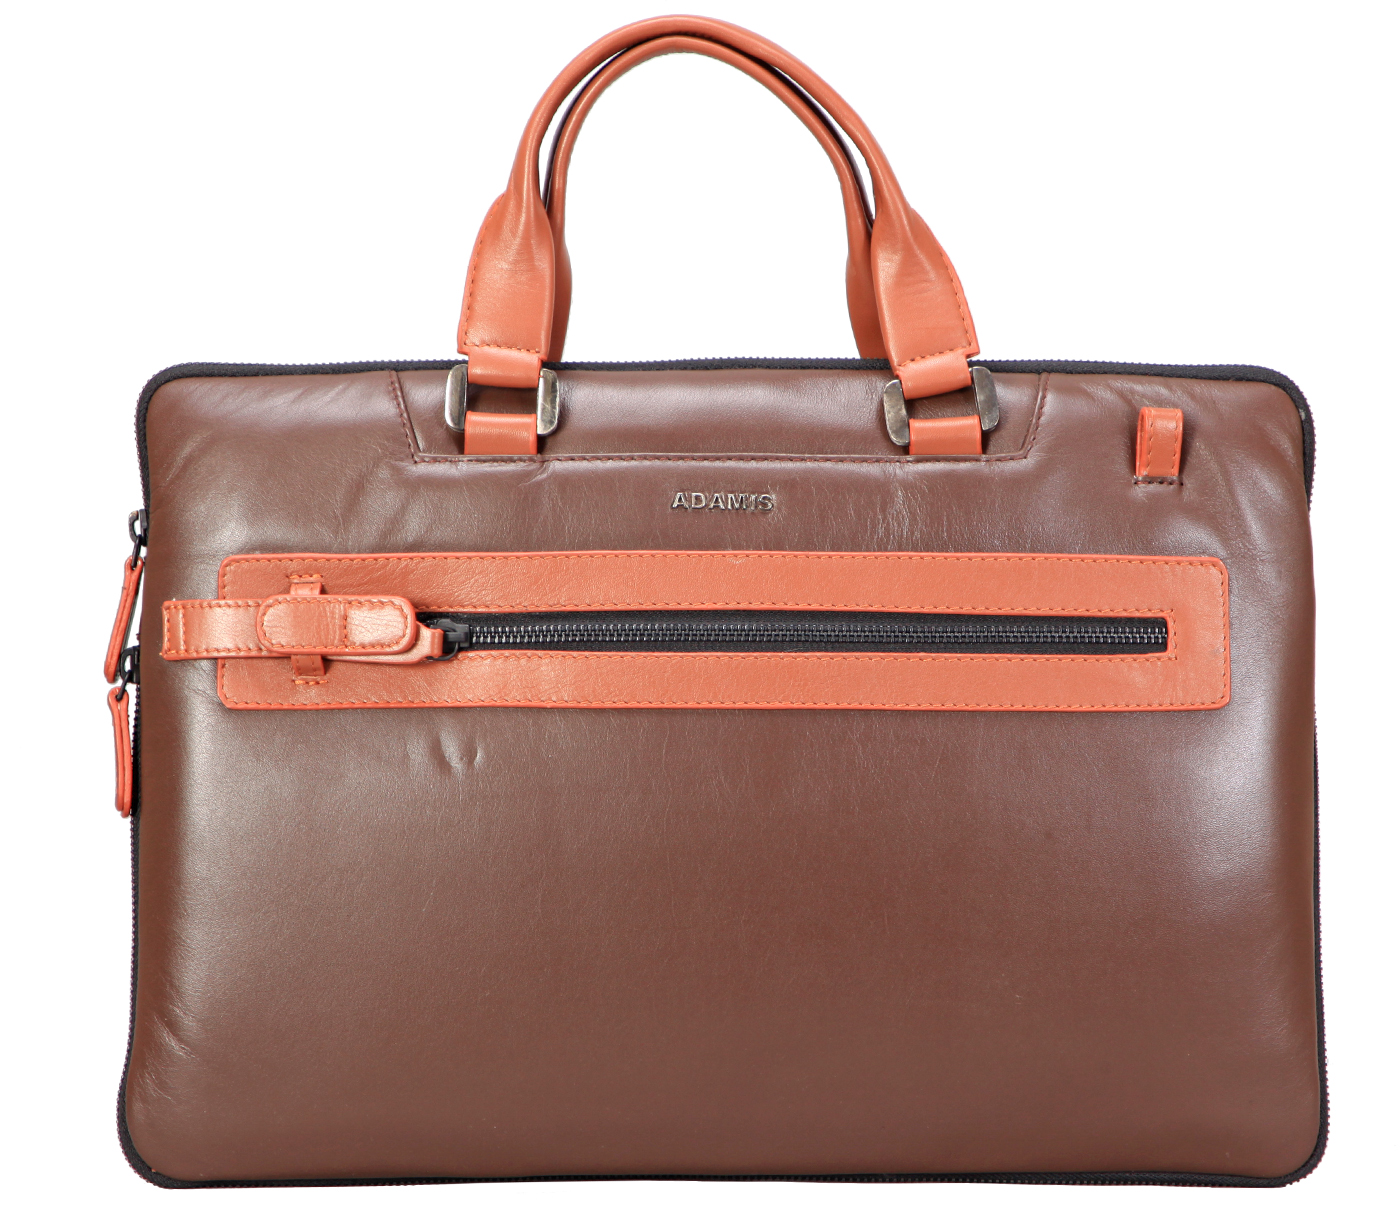 Portfolio / Laptop Bag - F73